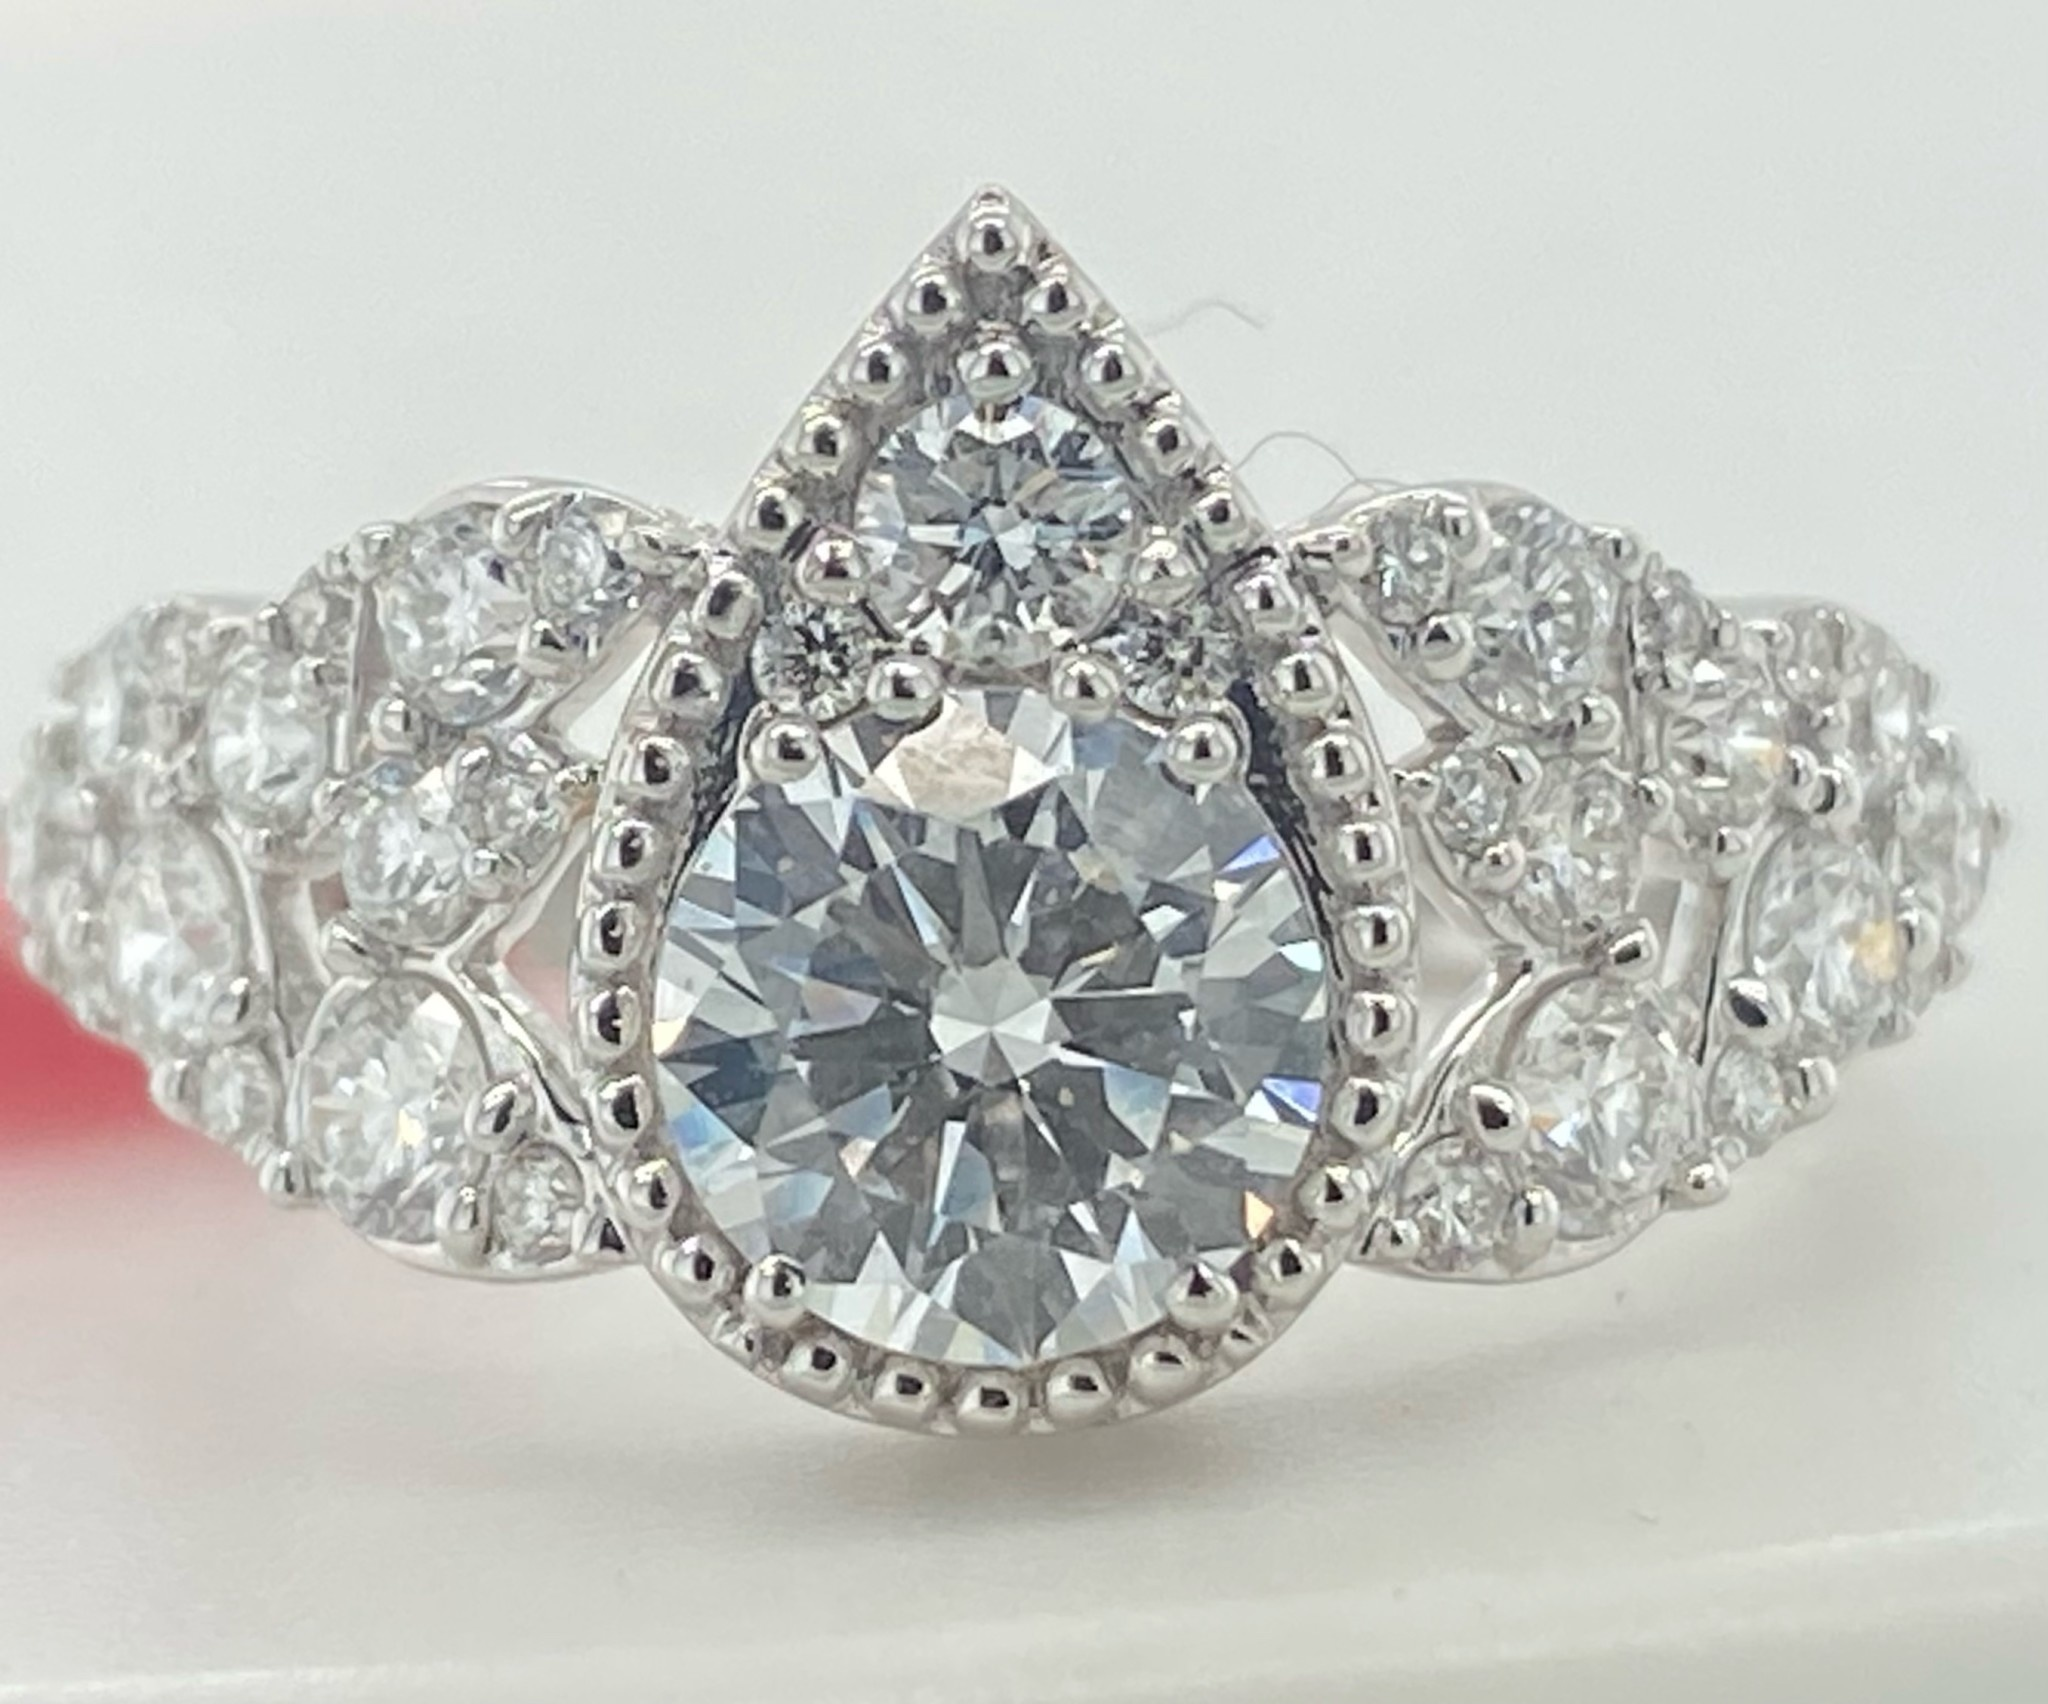 14KW 1.85TW LG Diamond Engagement Ring